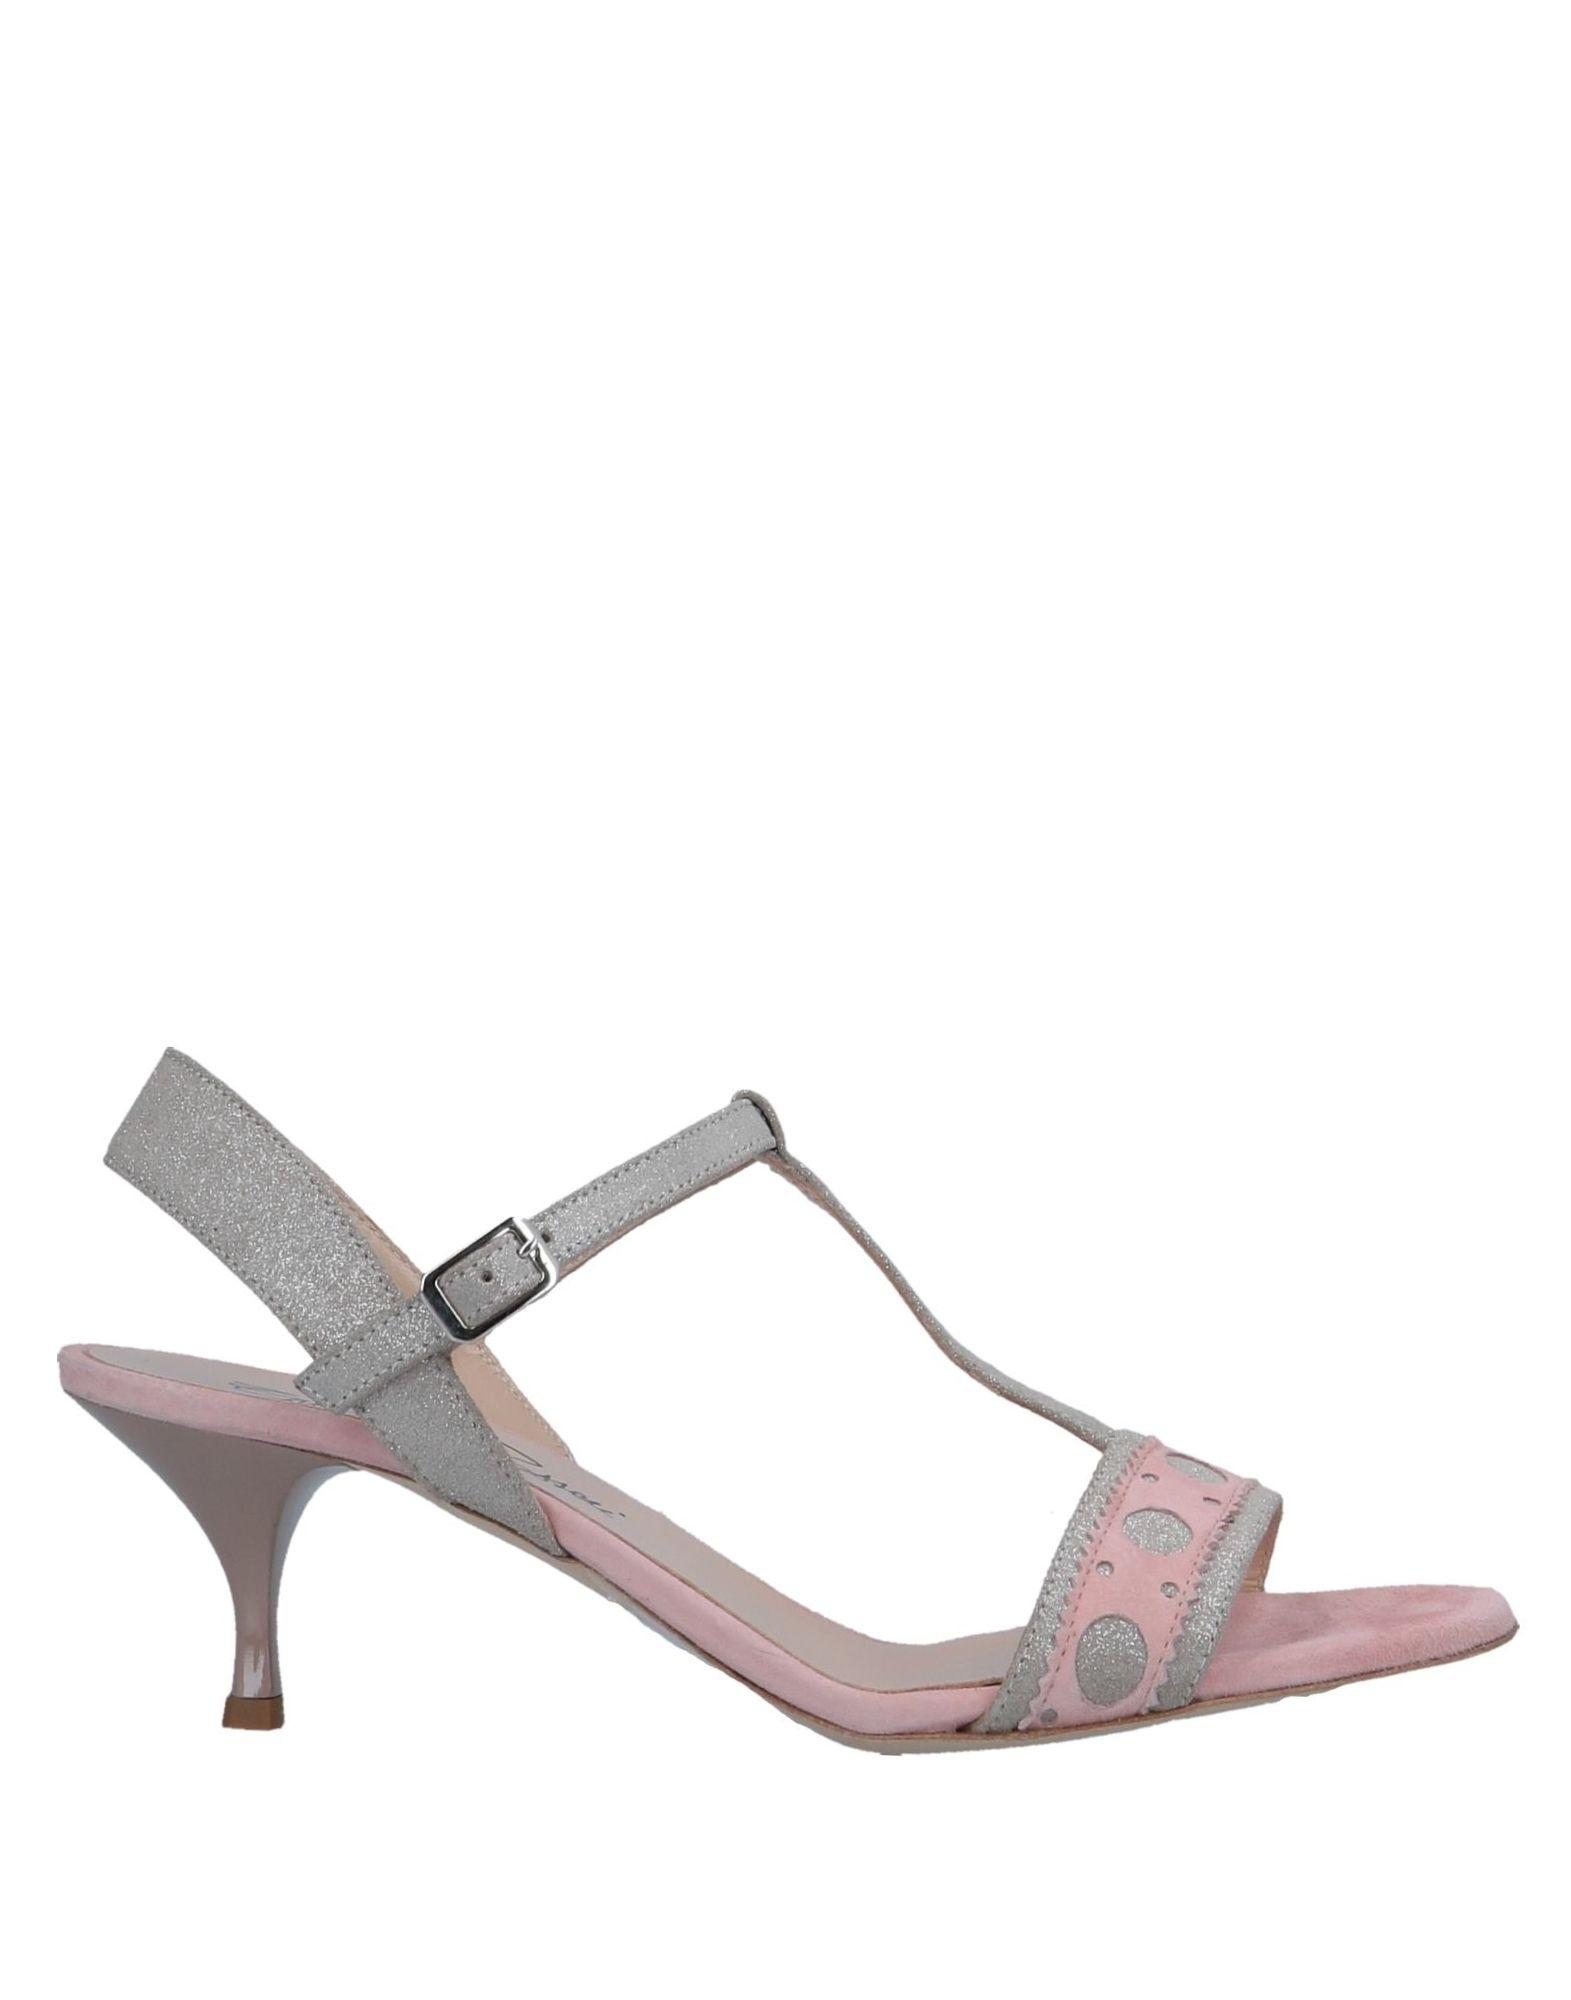 Emanuela Passeri Sandals - Sandals Women Emanuela Passeri Sandals - online on  Canada - 11569251WD 8c8fbe